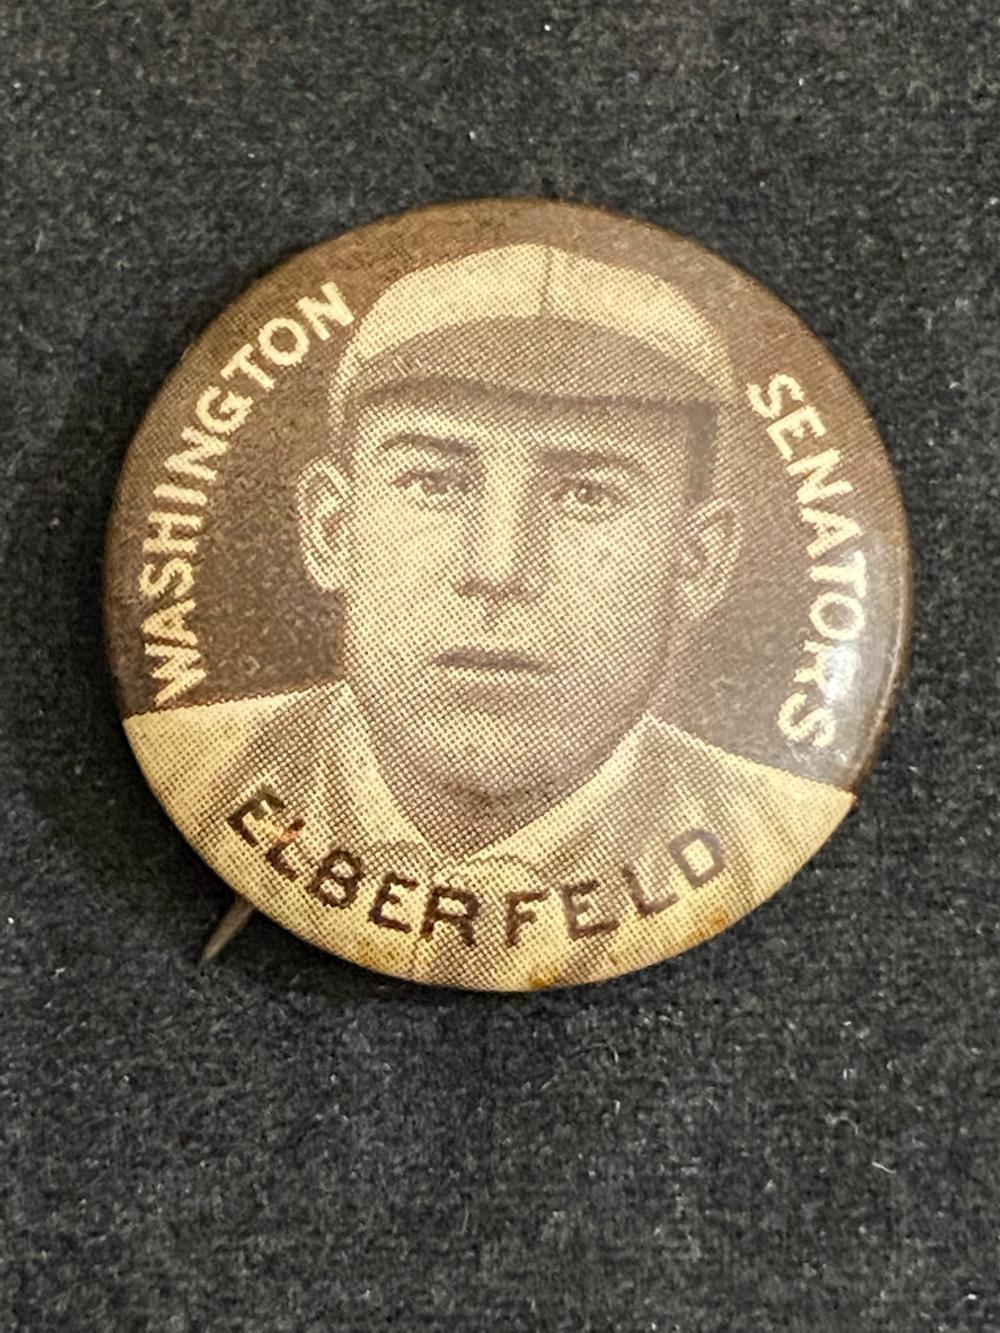 V1912 Sweet Caporal Kid Elberfeld Pin (Washington Senators)